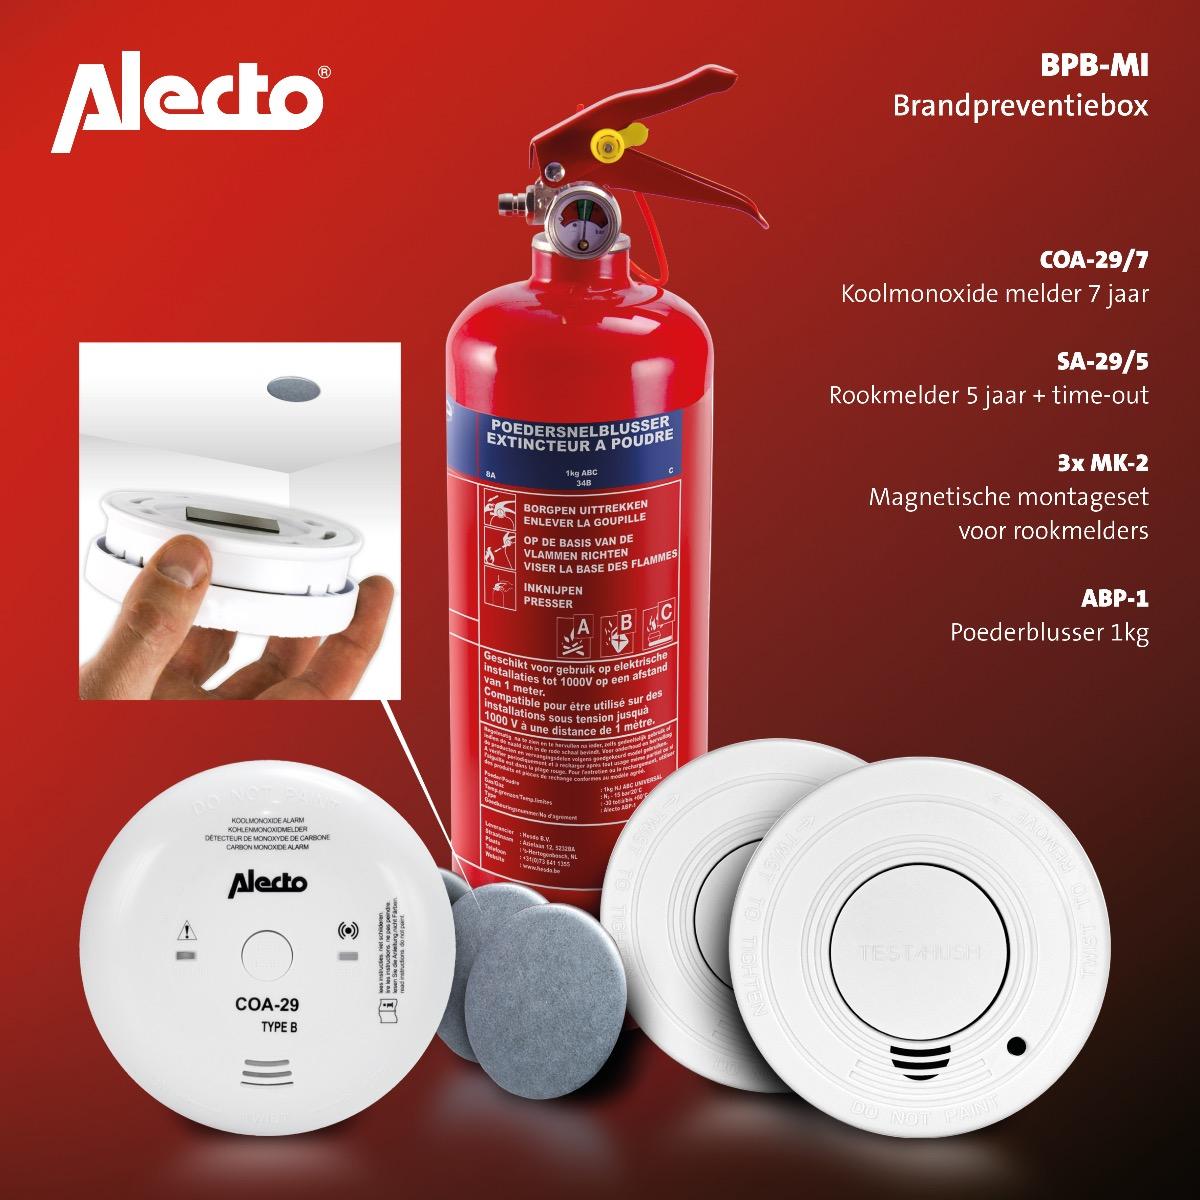 Brandpreventiebox 'Alles-in-1' Alecto BPB-MI